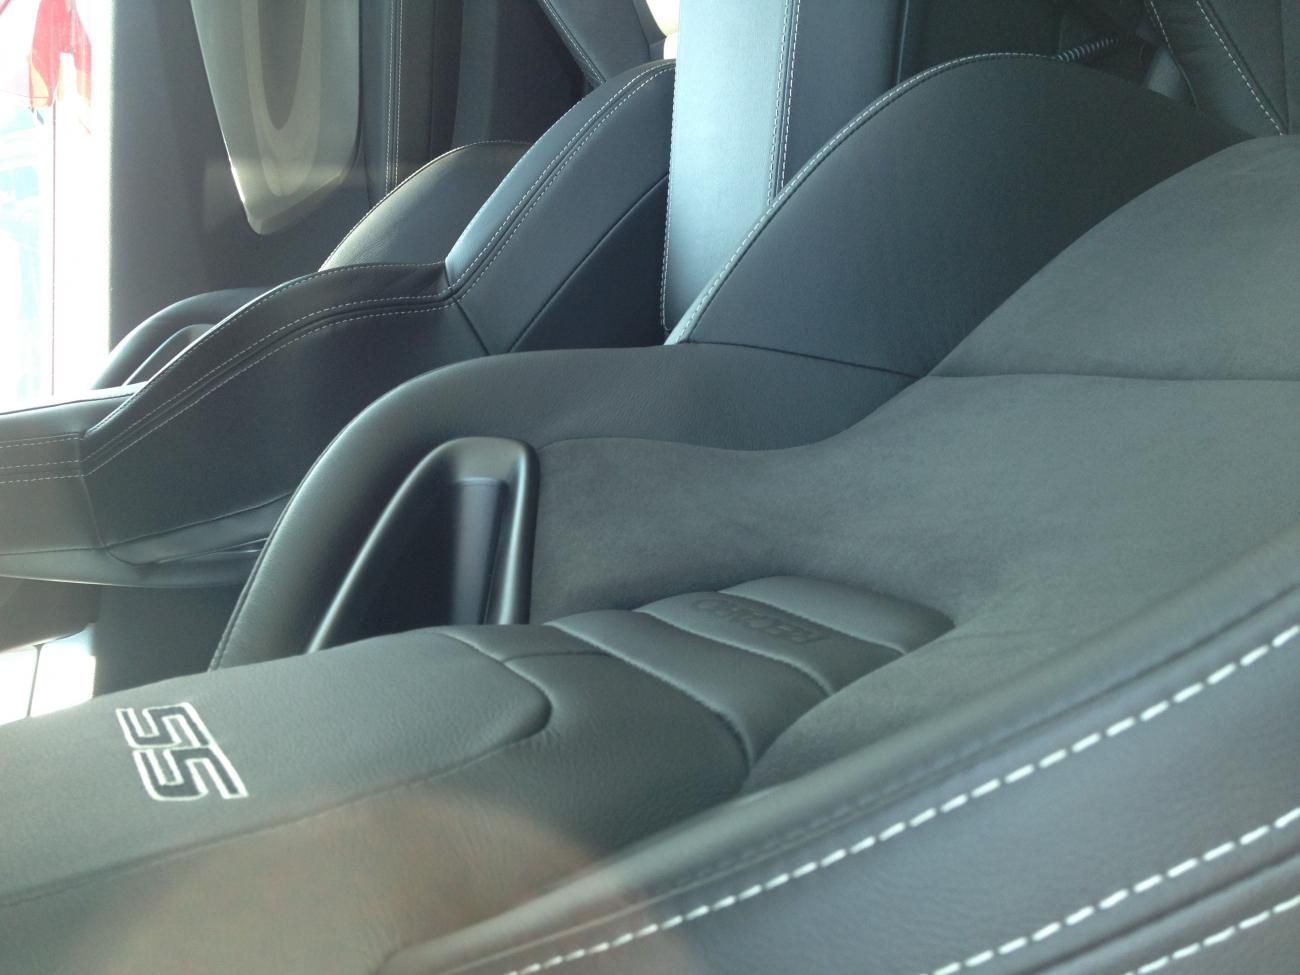 Recaro Seat Part Number Camaro5 Chevy Camaro Forum